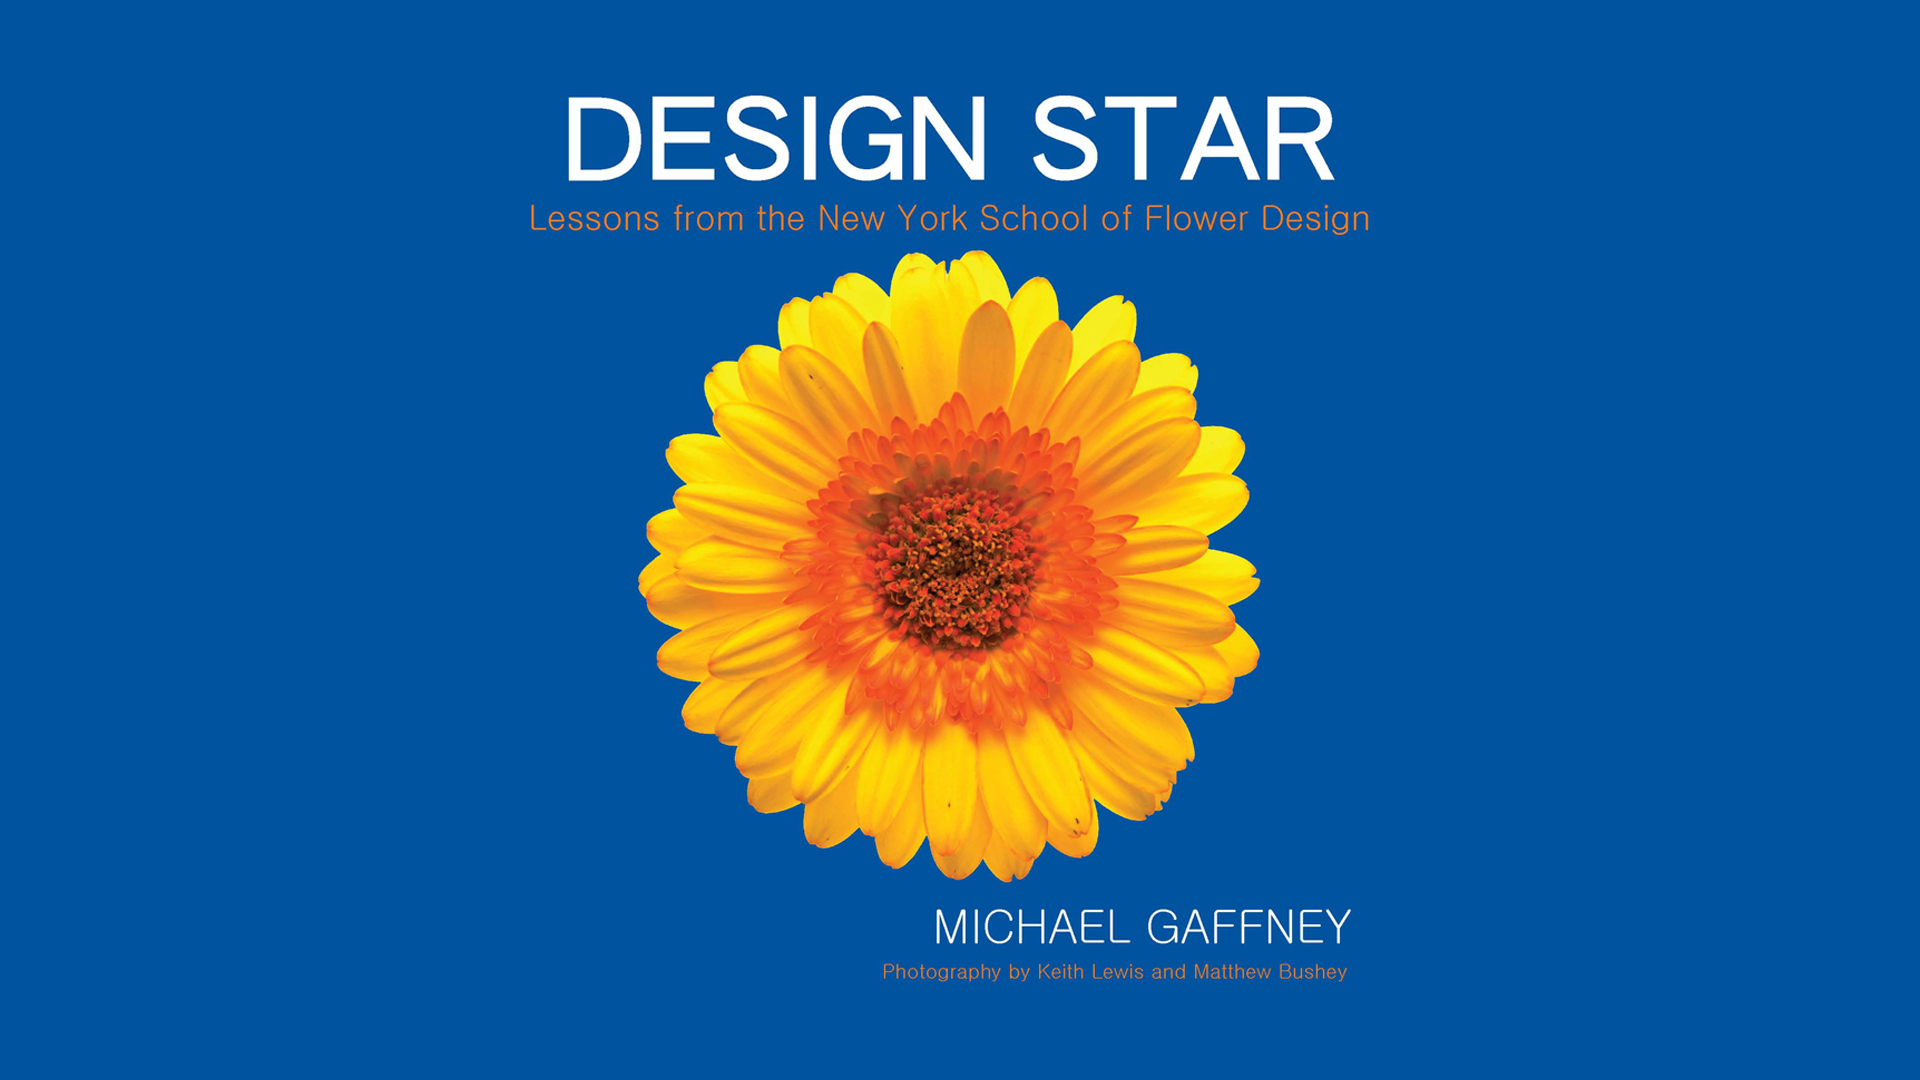 Tuition Floral Design School